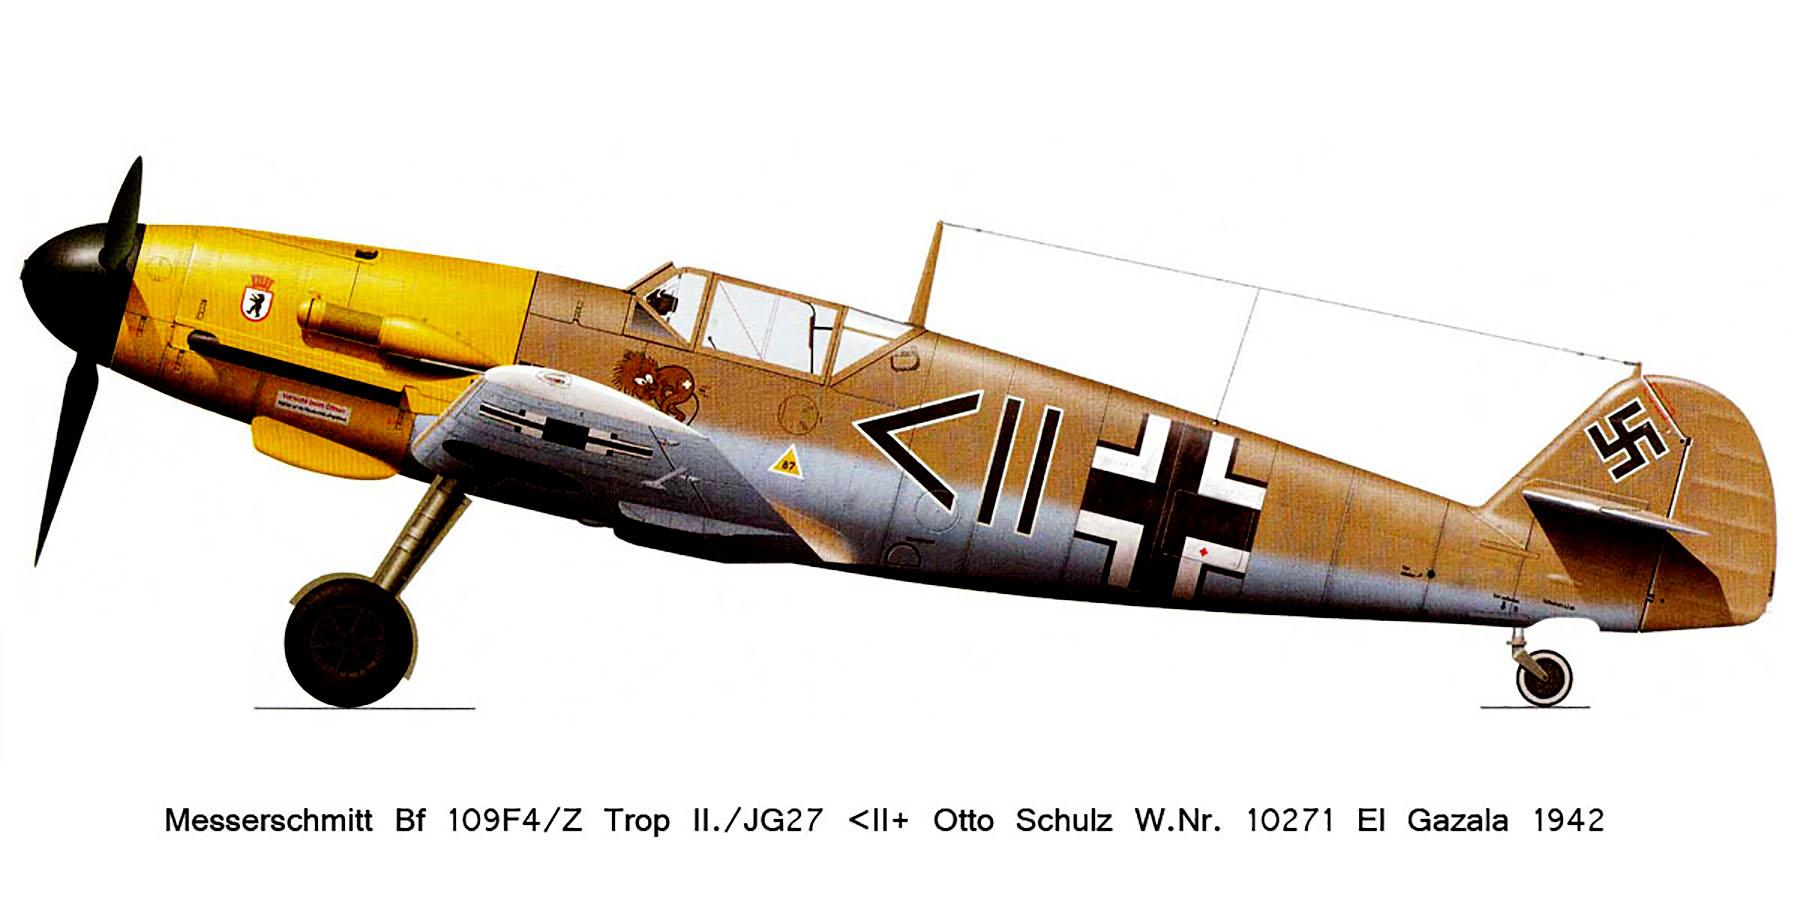 Messerschmitt Bf 109F4Trop Stab II.JG27 Otto Schulz WNr 10271 El Gazala 1941 0A